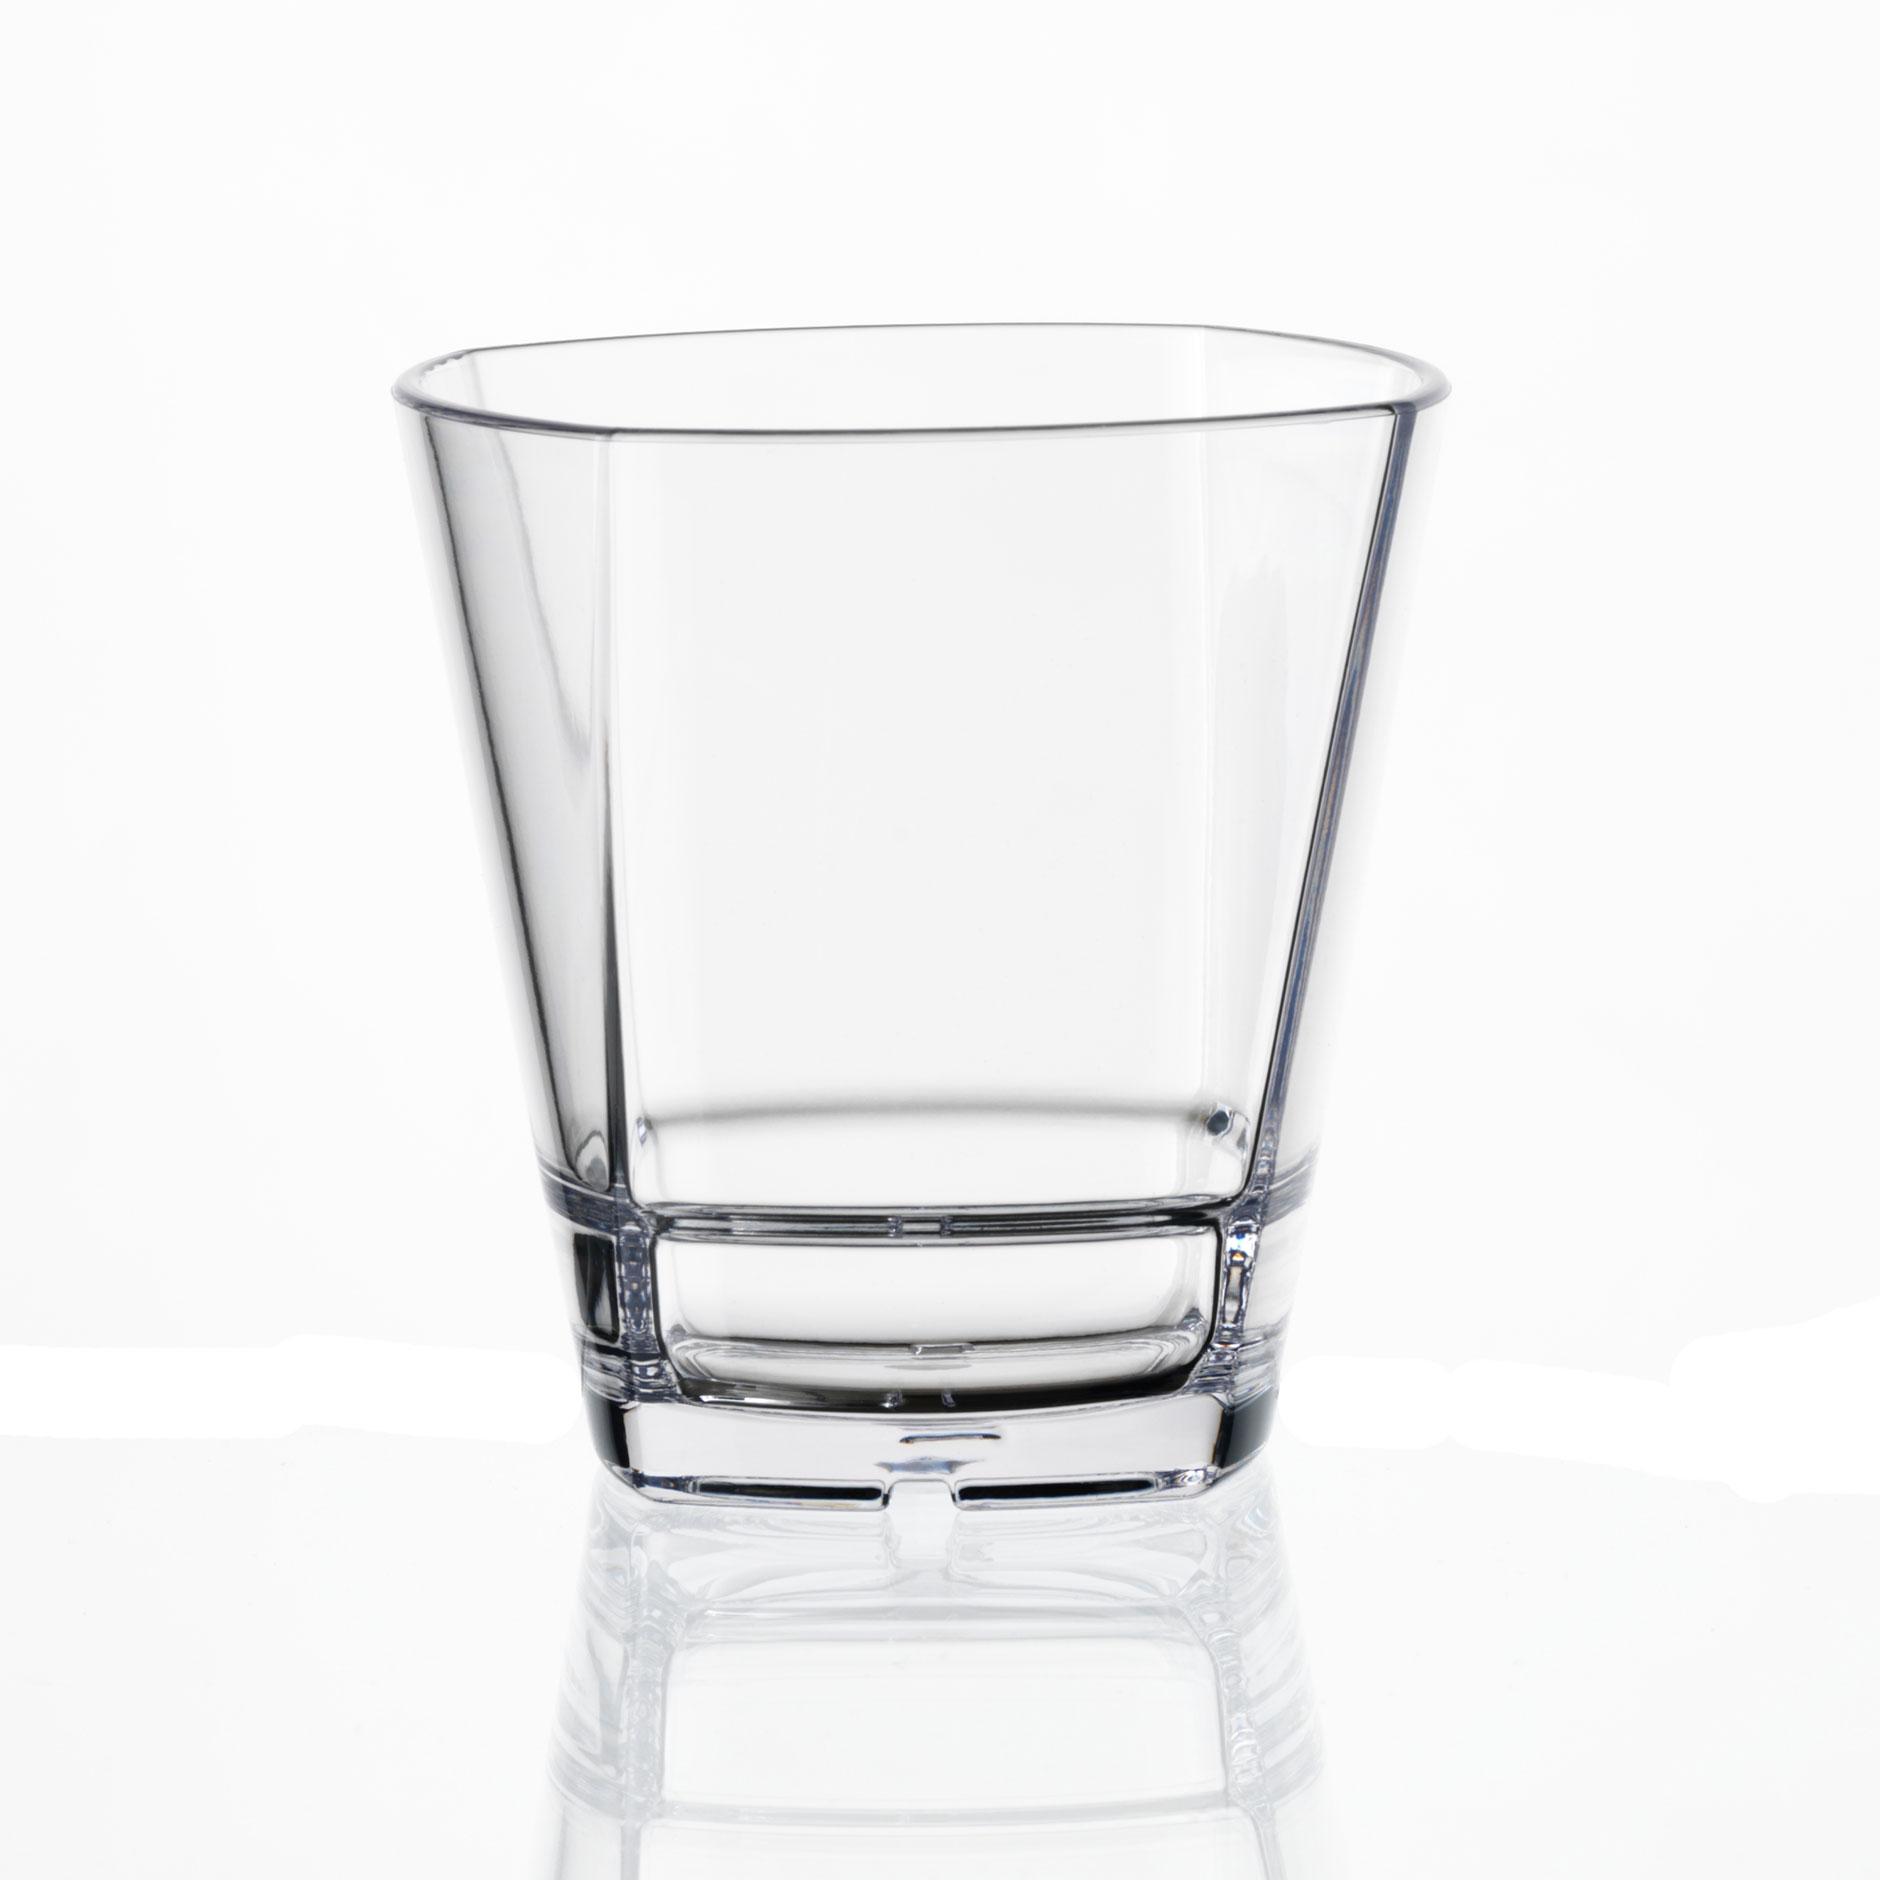 Libbey Glass 92442 glassware, plastic